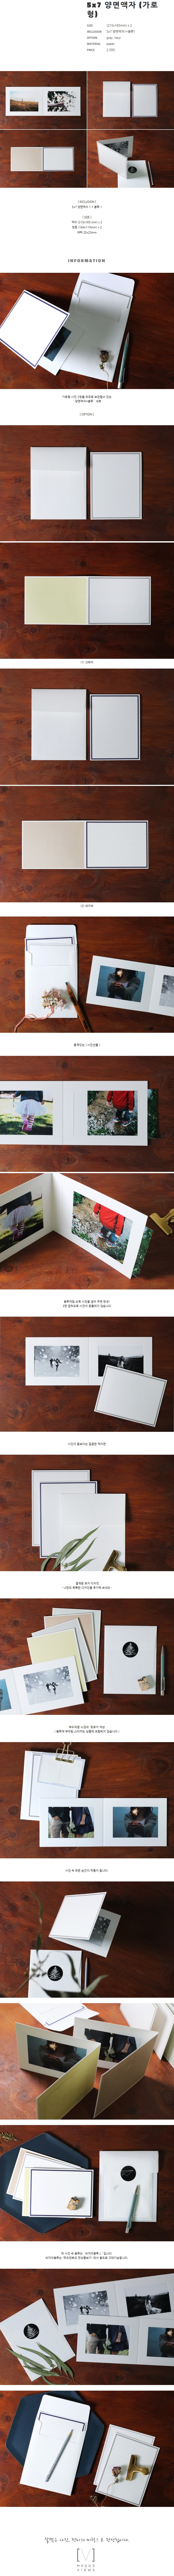 5x7 양면액자 (가로형) - 무즈앤뷰즈, 2,500원, 테마앨범/테마북, 포토박스/프레임